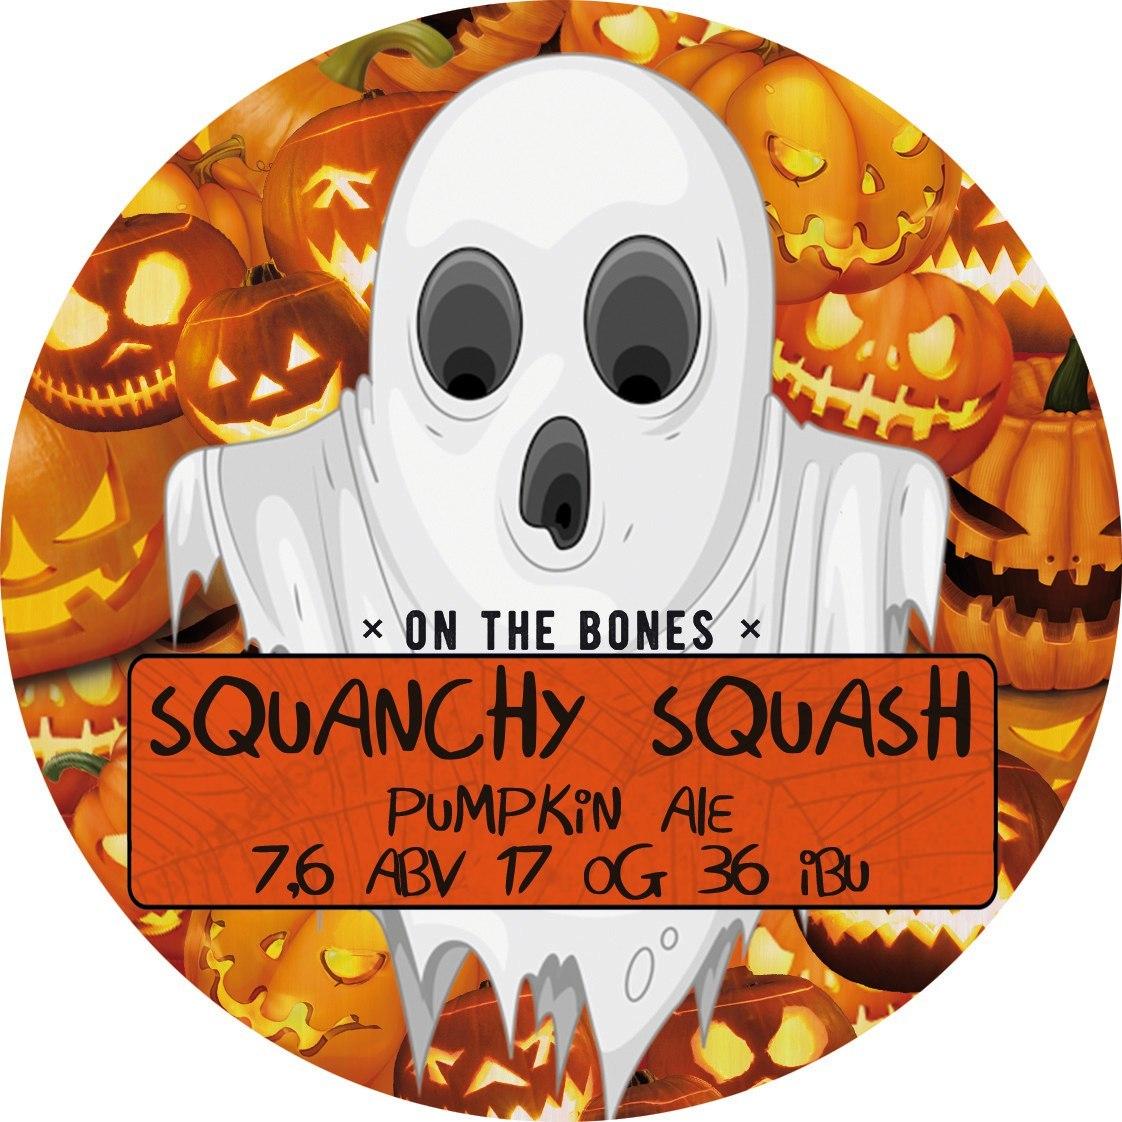 https://static-sl.insales.ru/images/products/1/792/134390552/Squanchy_Squash_пиво_On_the_bones.jpg